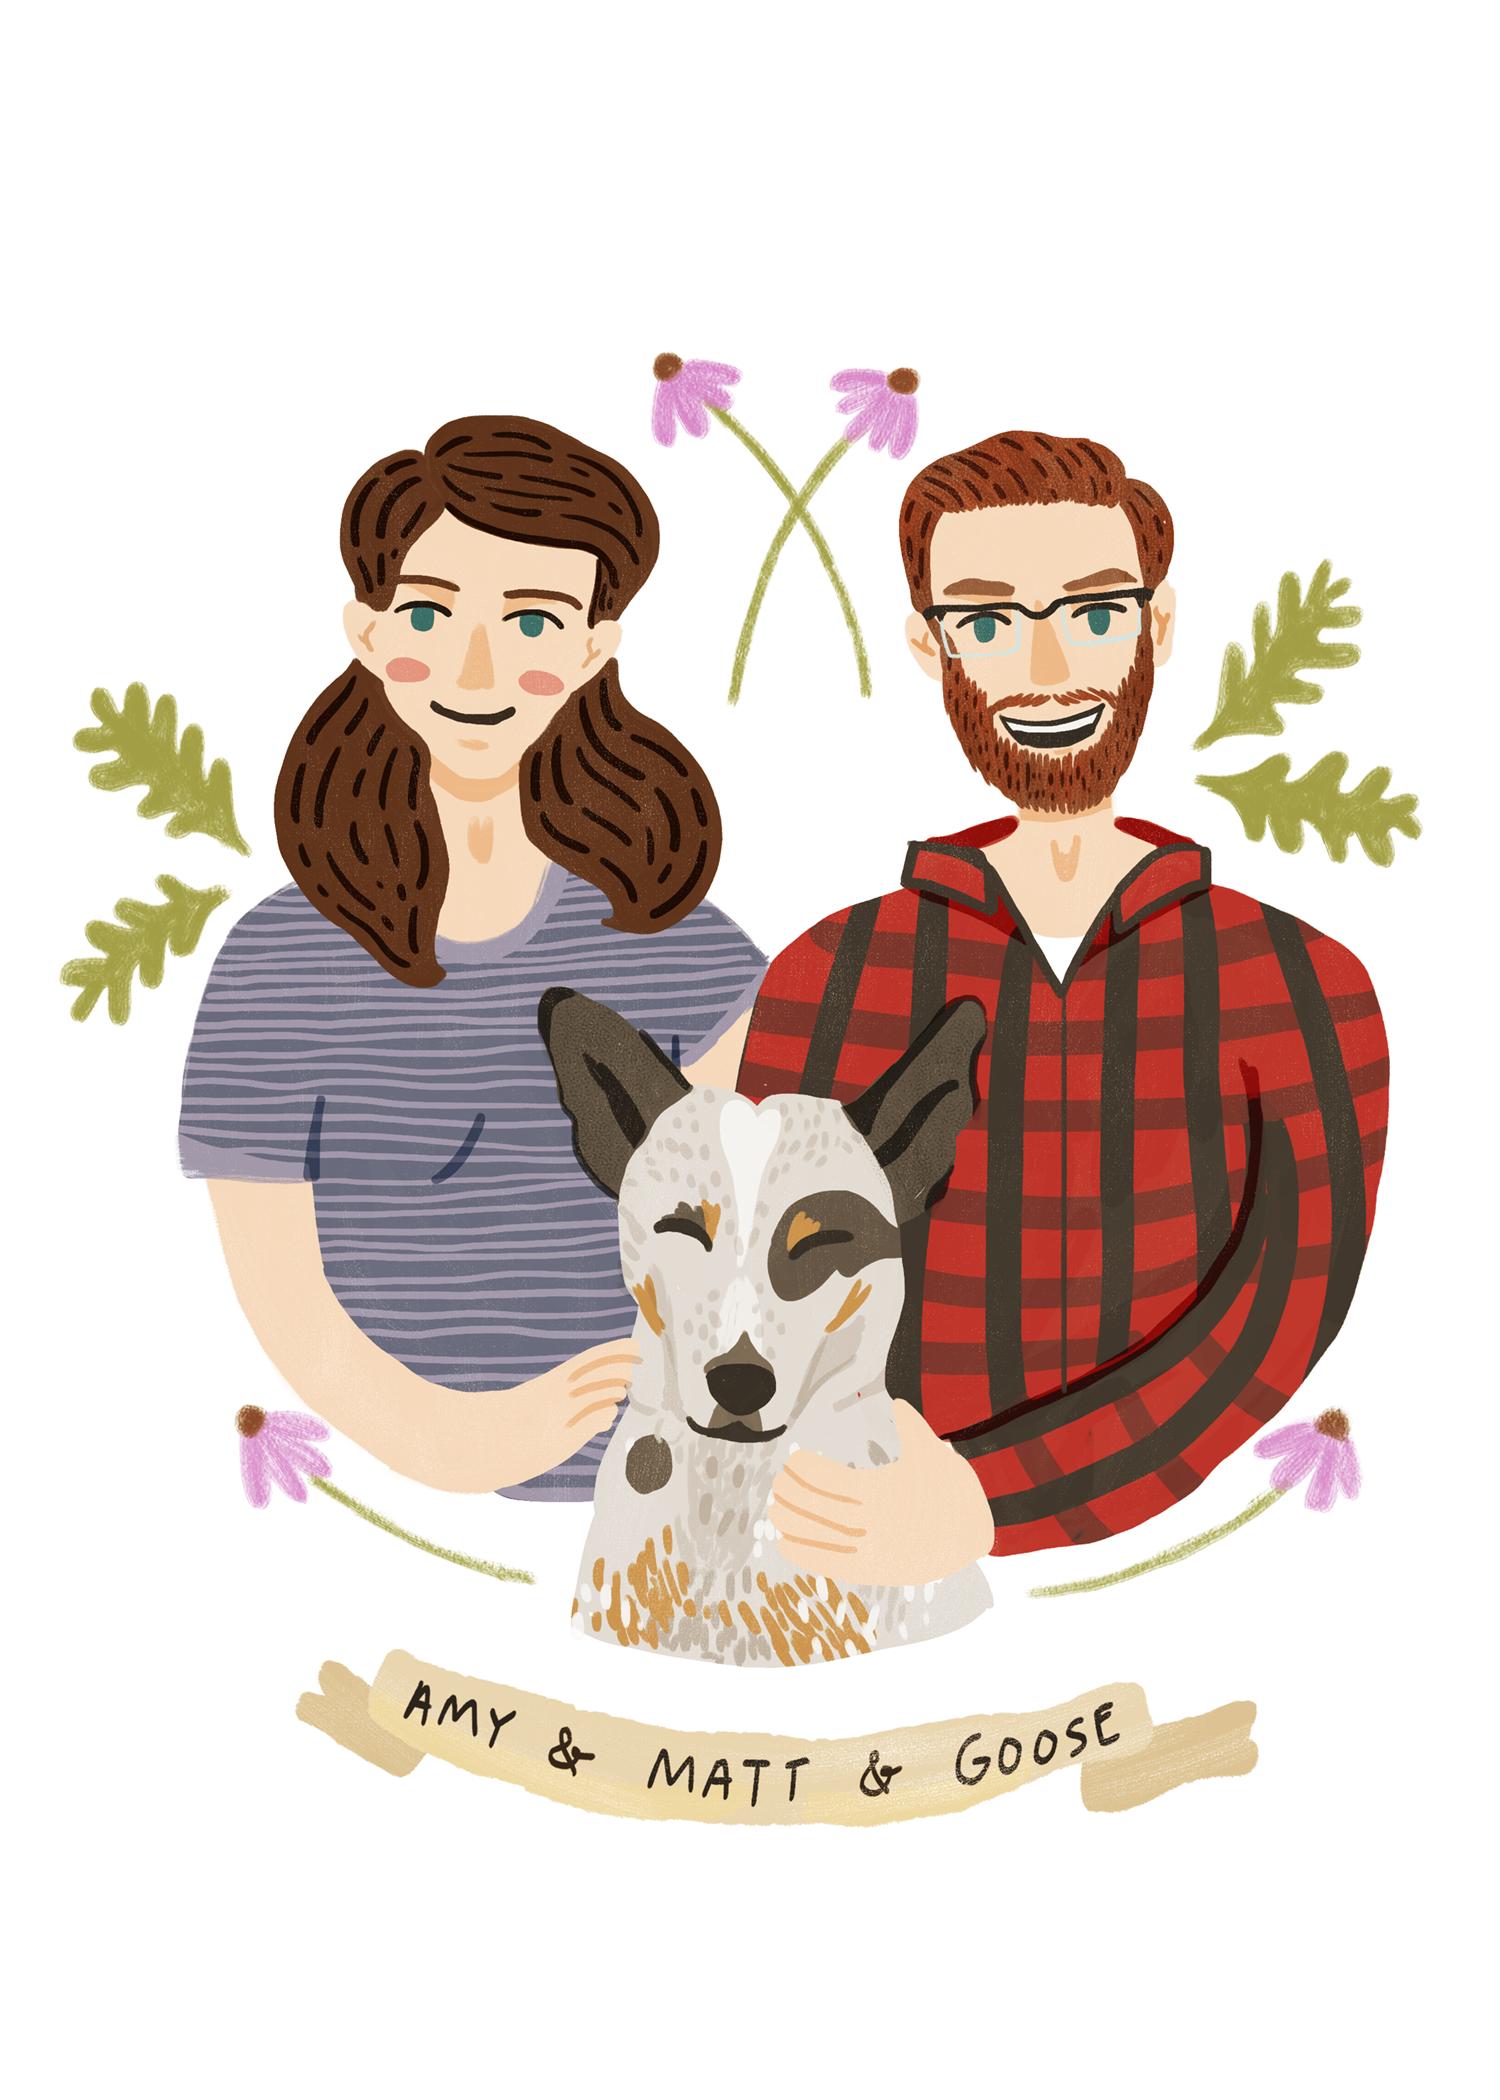 Amy Matt and Goose final.png